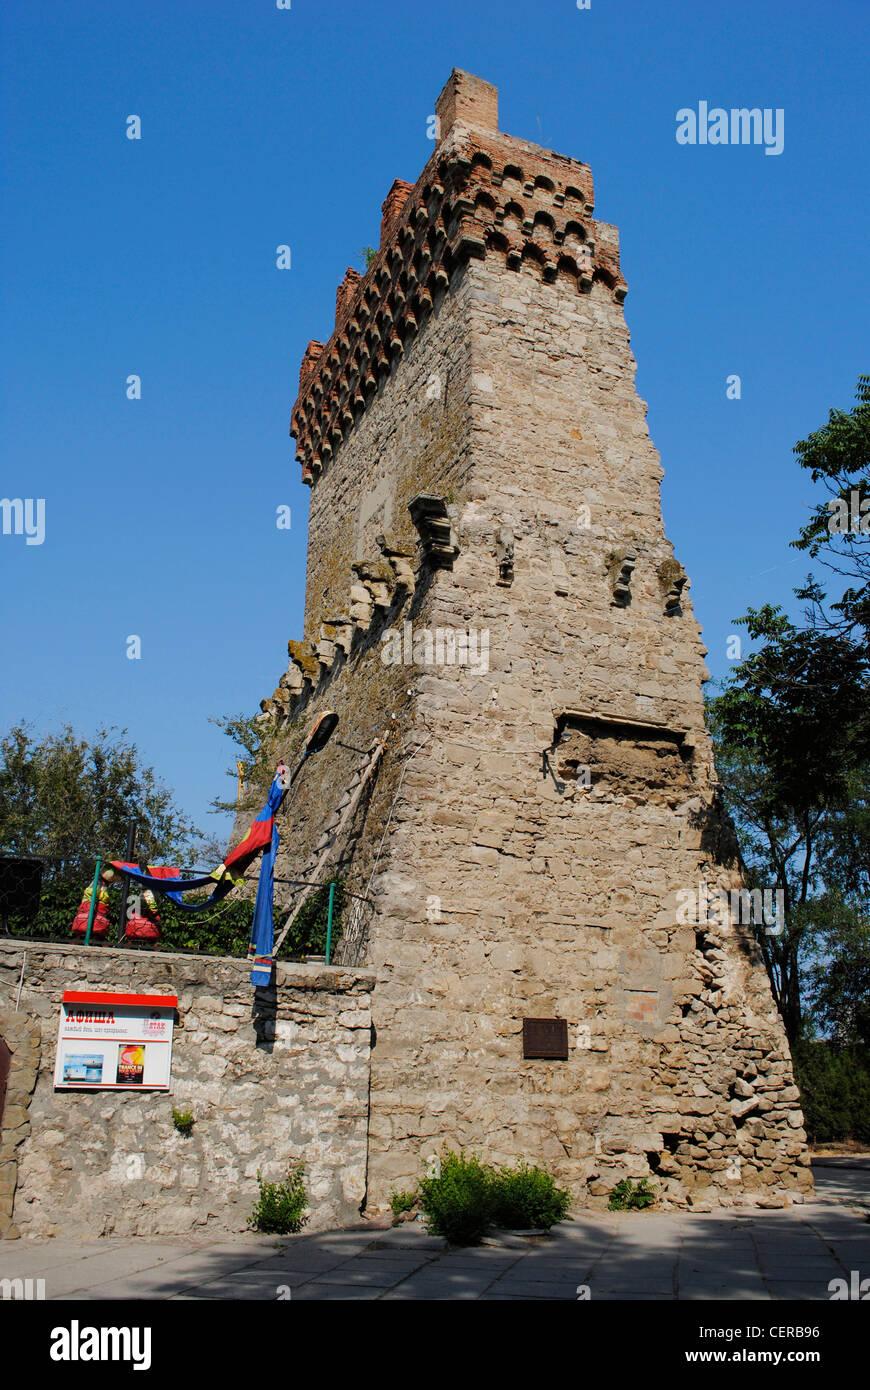 Ukraine. Autonomous Republic of Crimea. Feodosiya. Genoese Fortress. Saint Konstantin Tower. 14th century. Restored - Stock Image